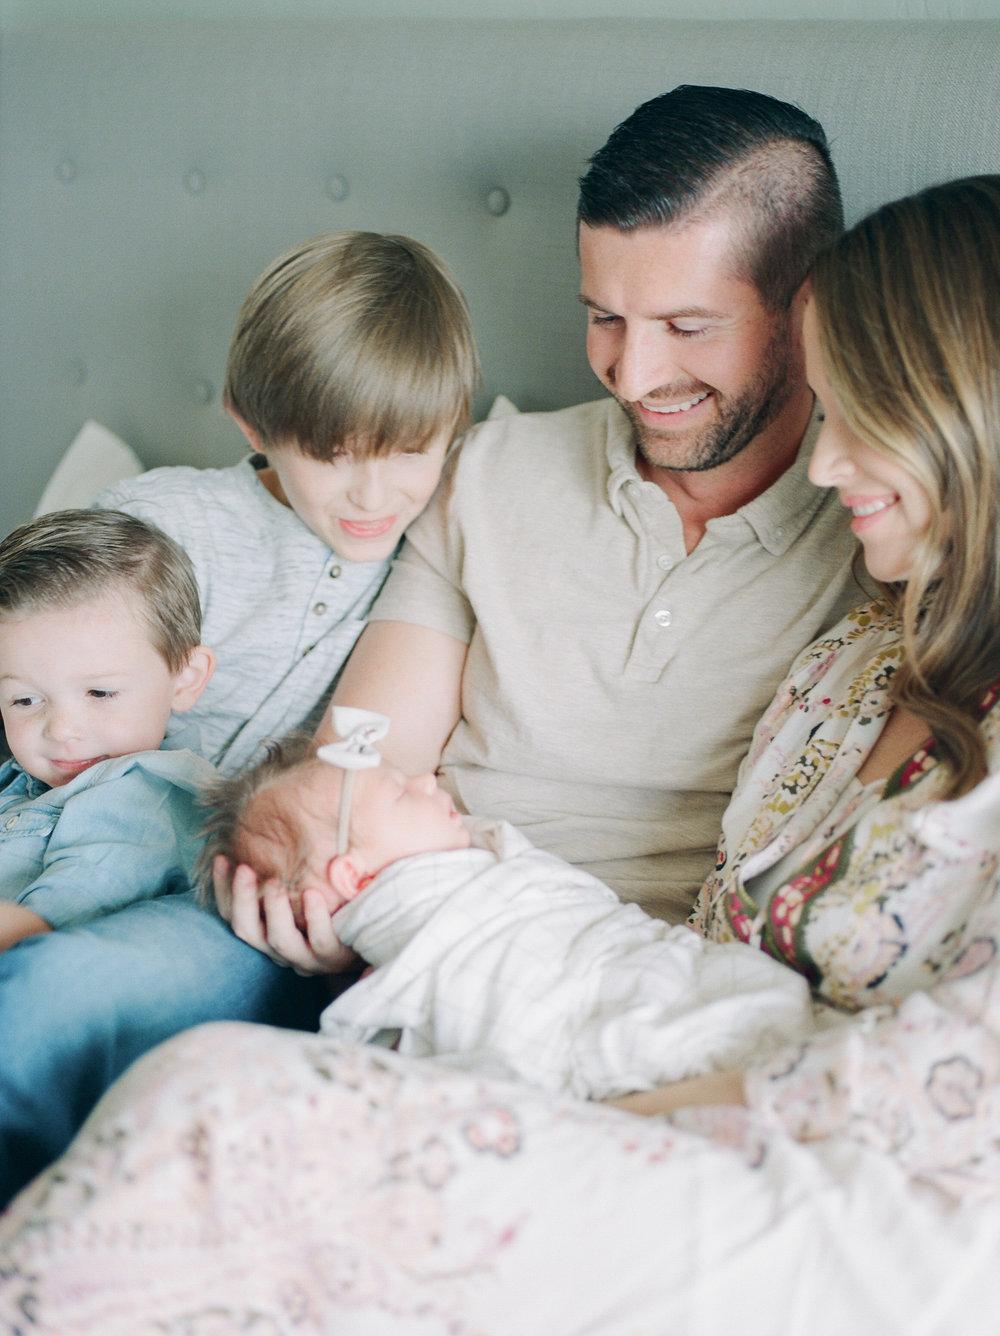 kels&michael_brimhallfamily-26.jpg